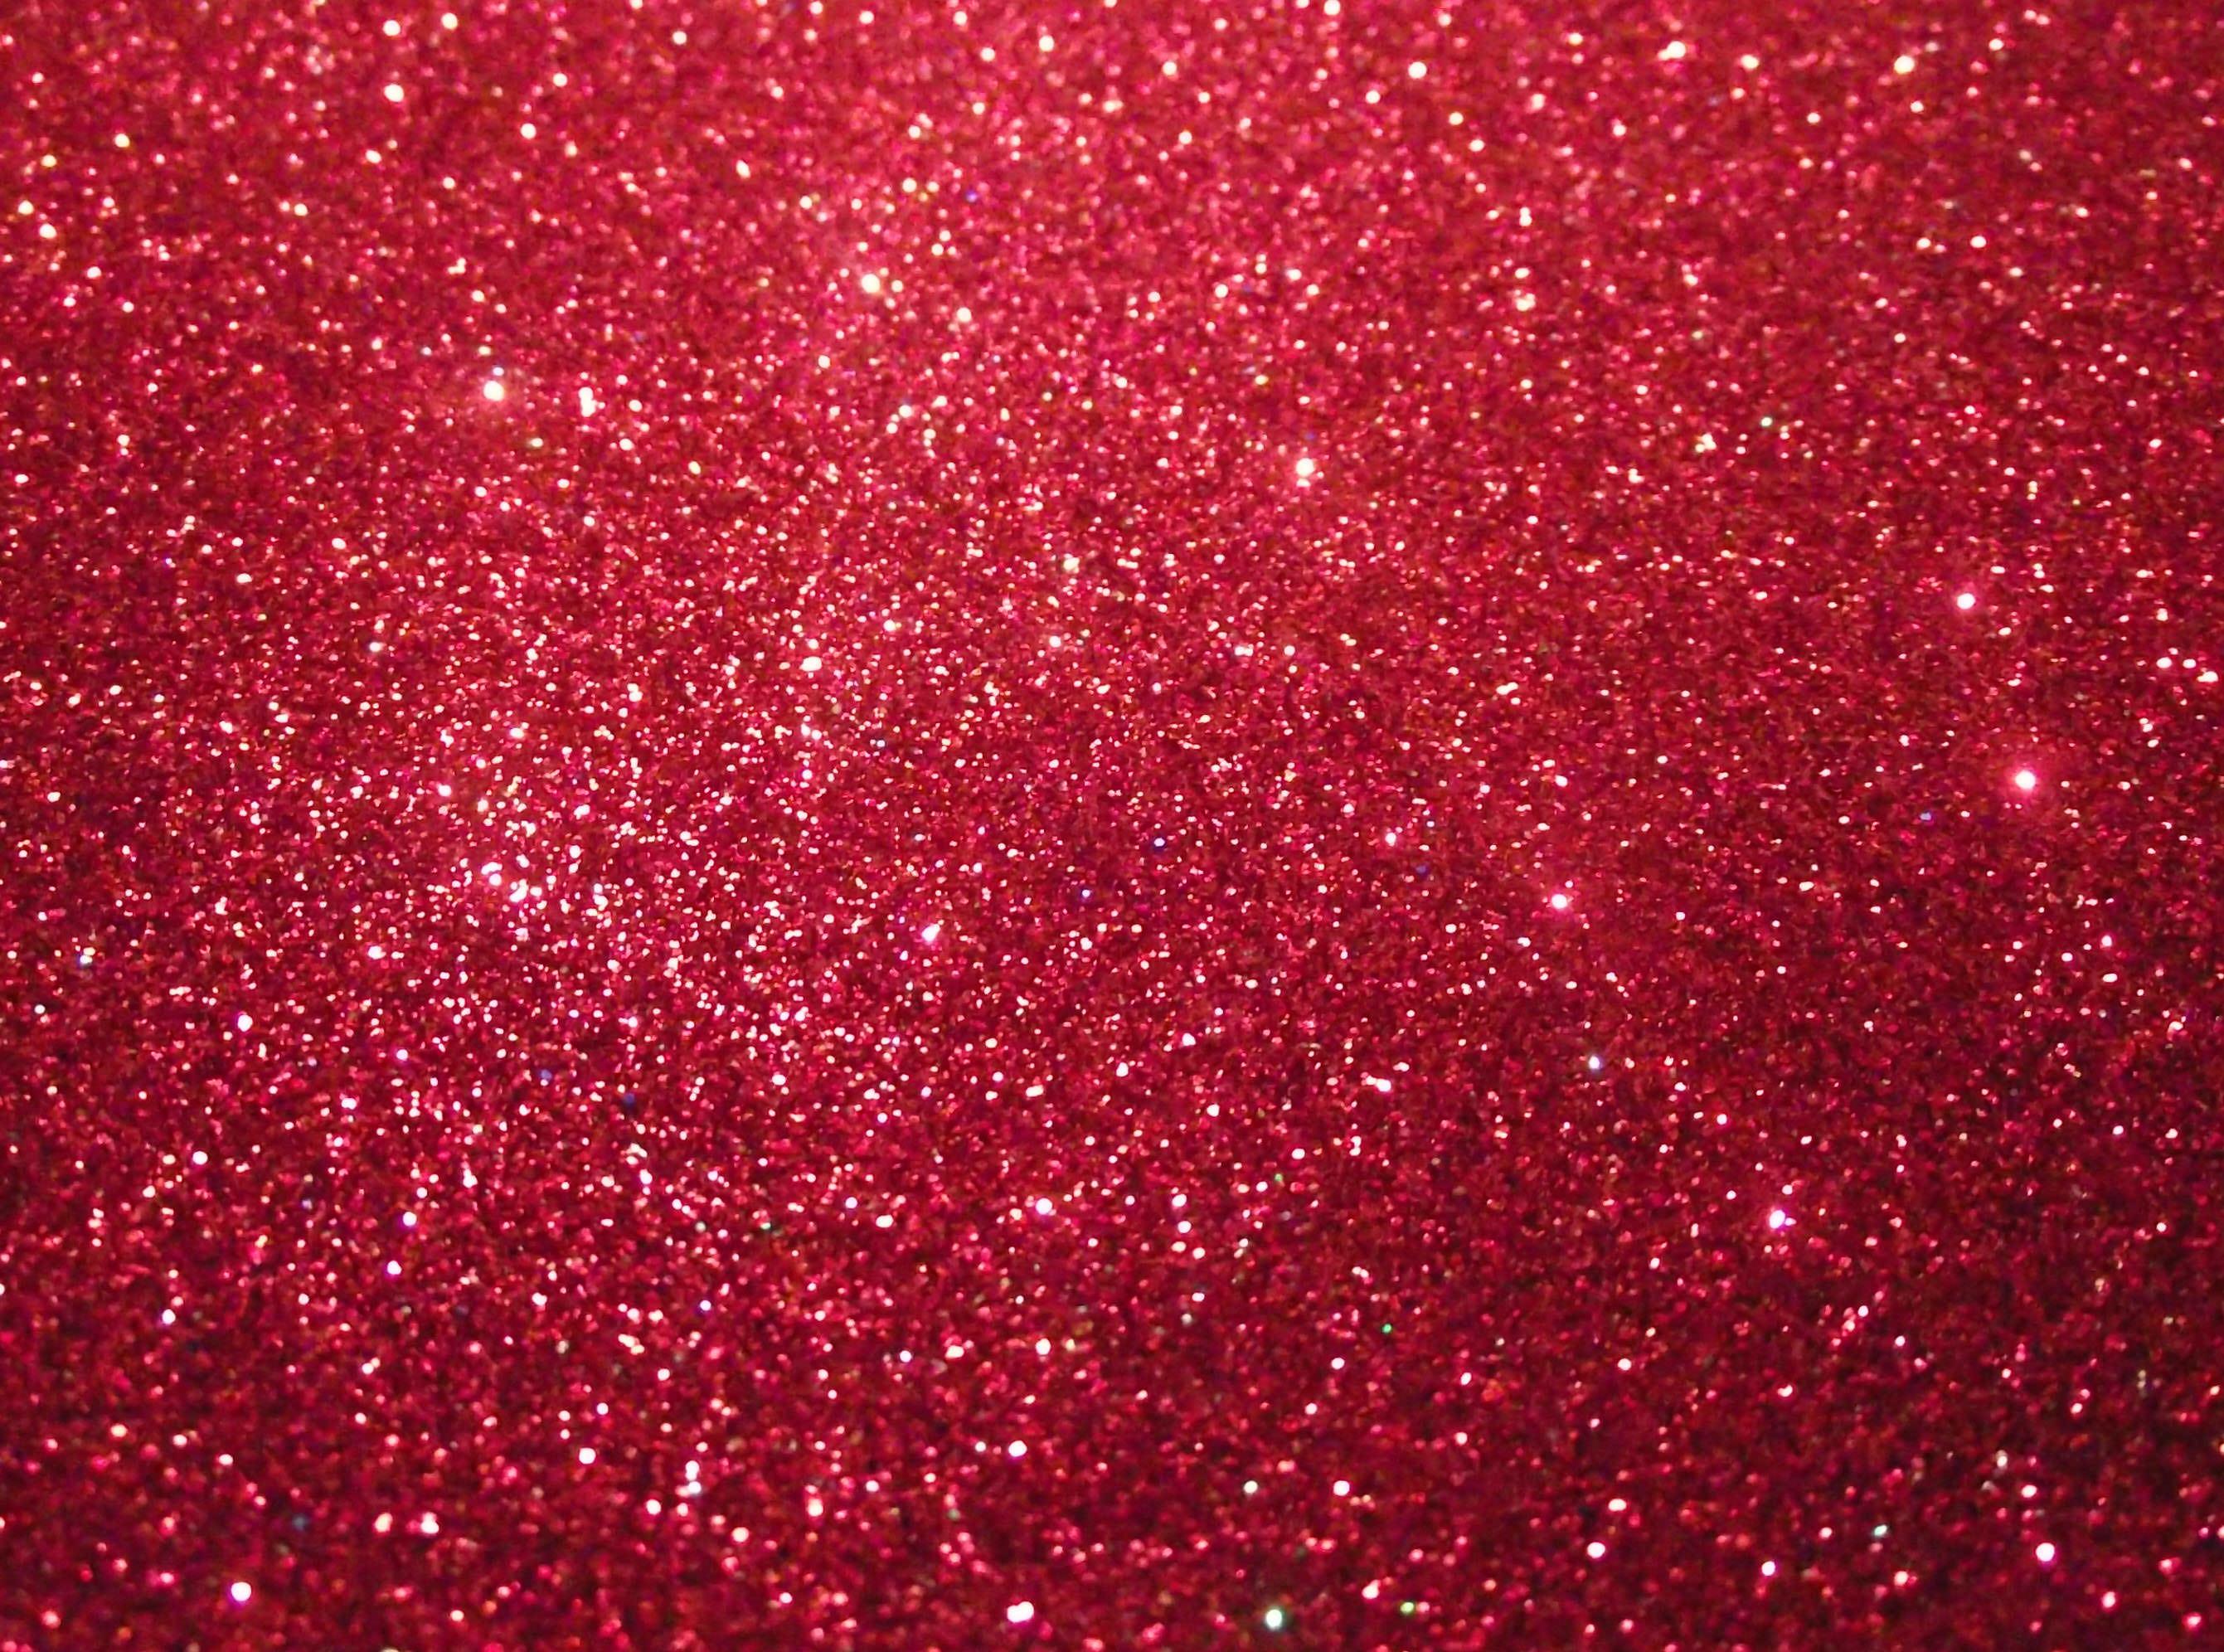 tumblr glitter backgrounds - Onwe.bioinnovate.co for light pink glitter background tumblr  35fsj